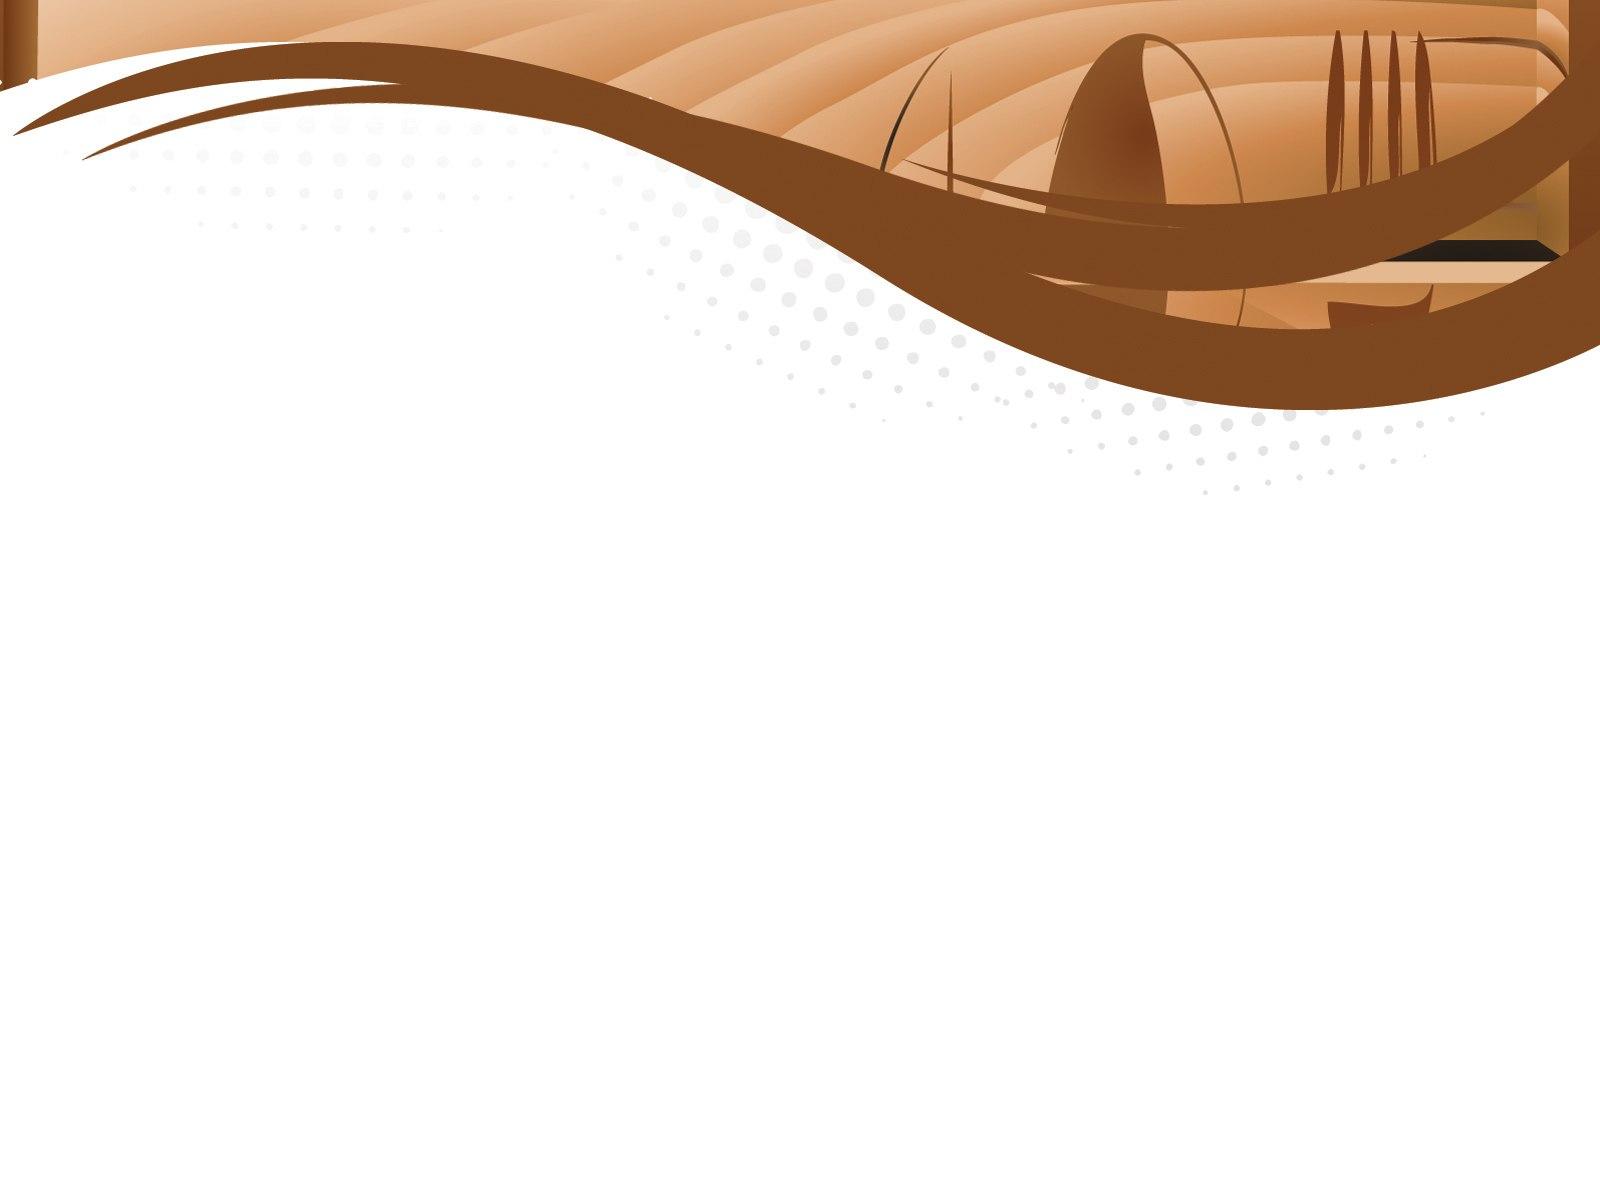 Restaurant Menu Theme Powerpoint Templates  Food  Drink  Free Ppt With Powerpoint Restaurant Menu Template